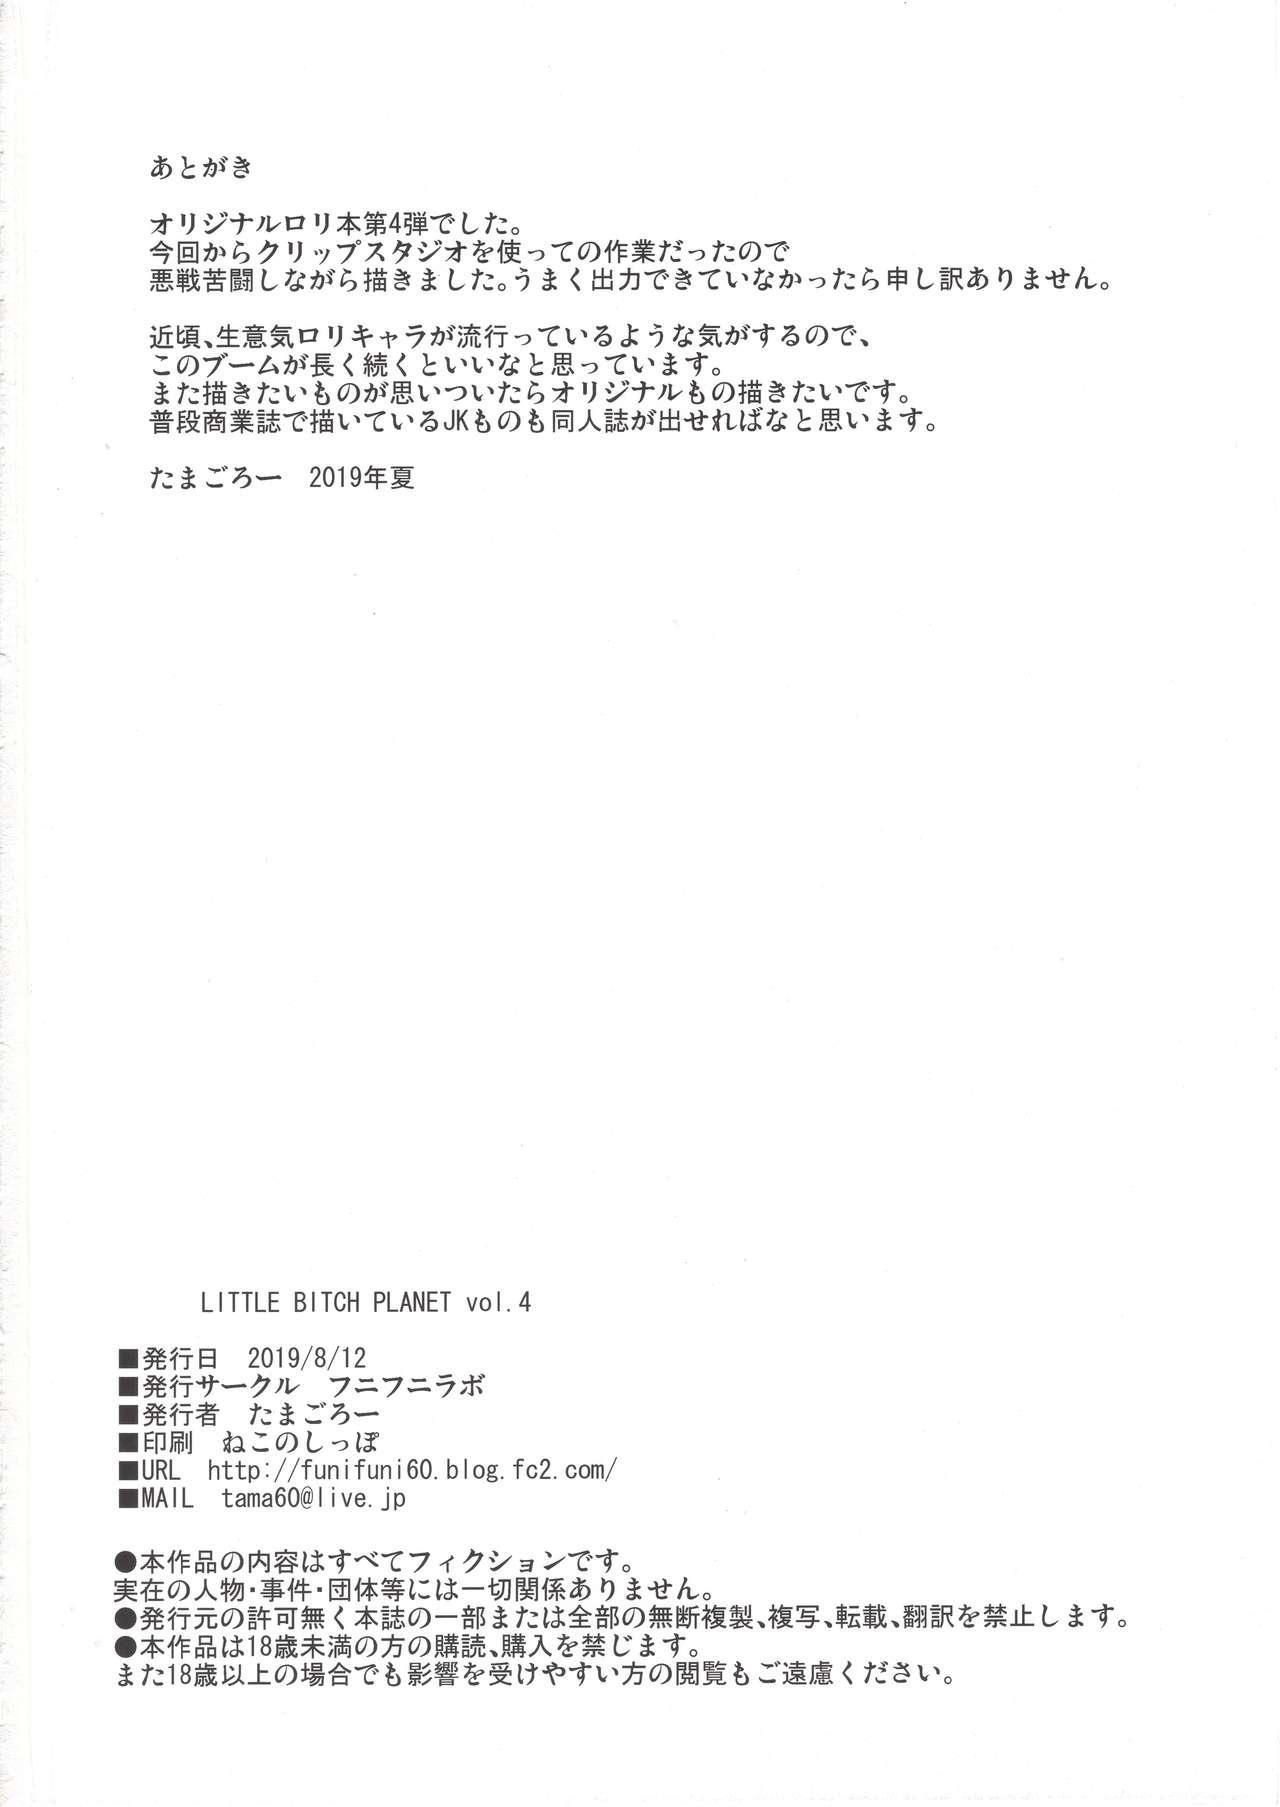 LittleBitchPlanet Vol. 4 + NKDC Vol. 11 26